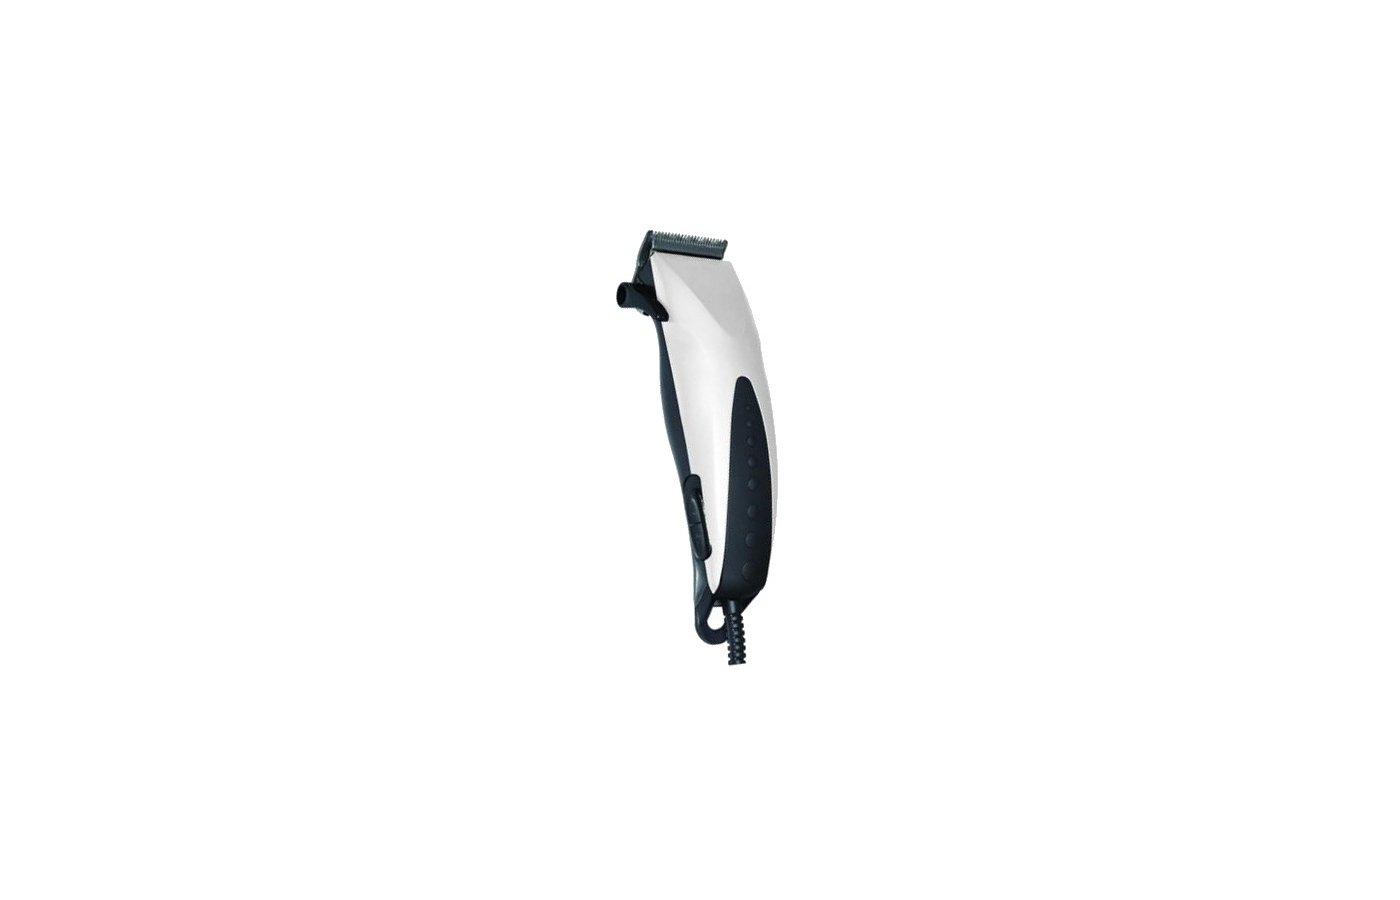 Машинка для стрижки волос IRIT IR-3305